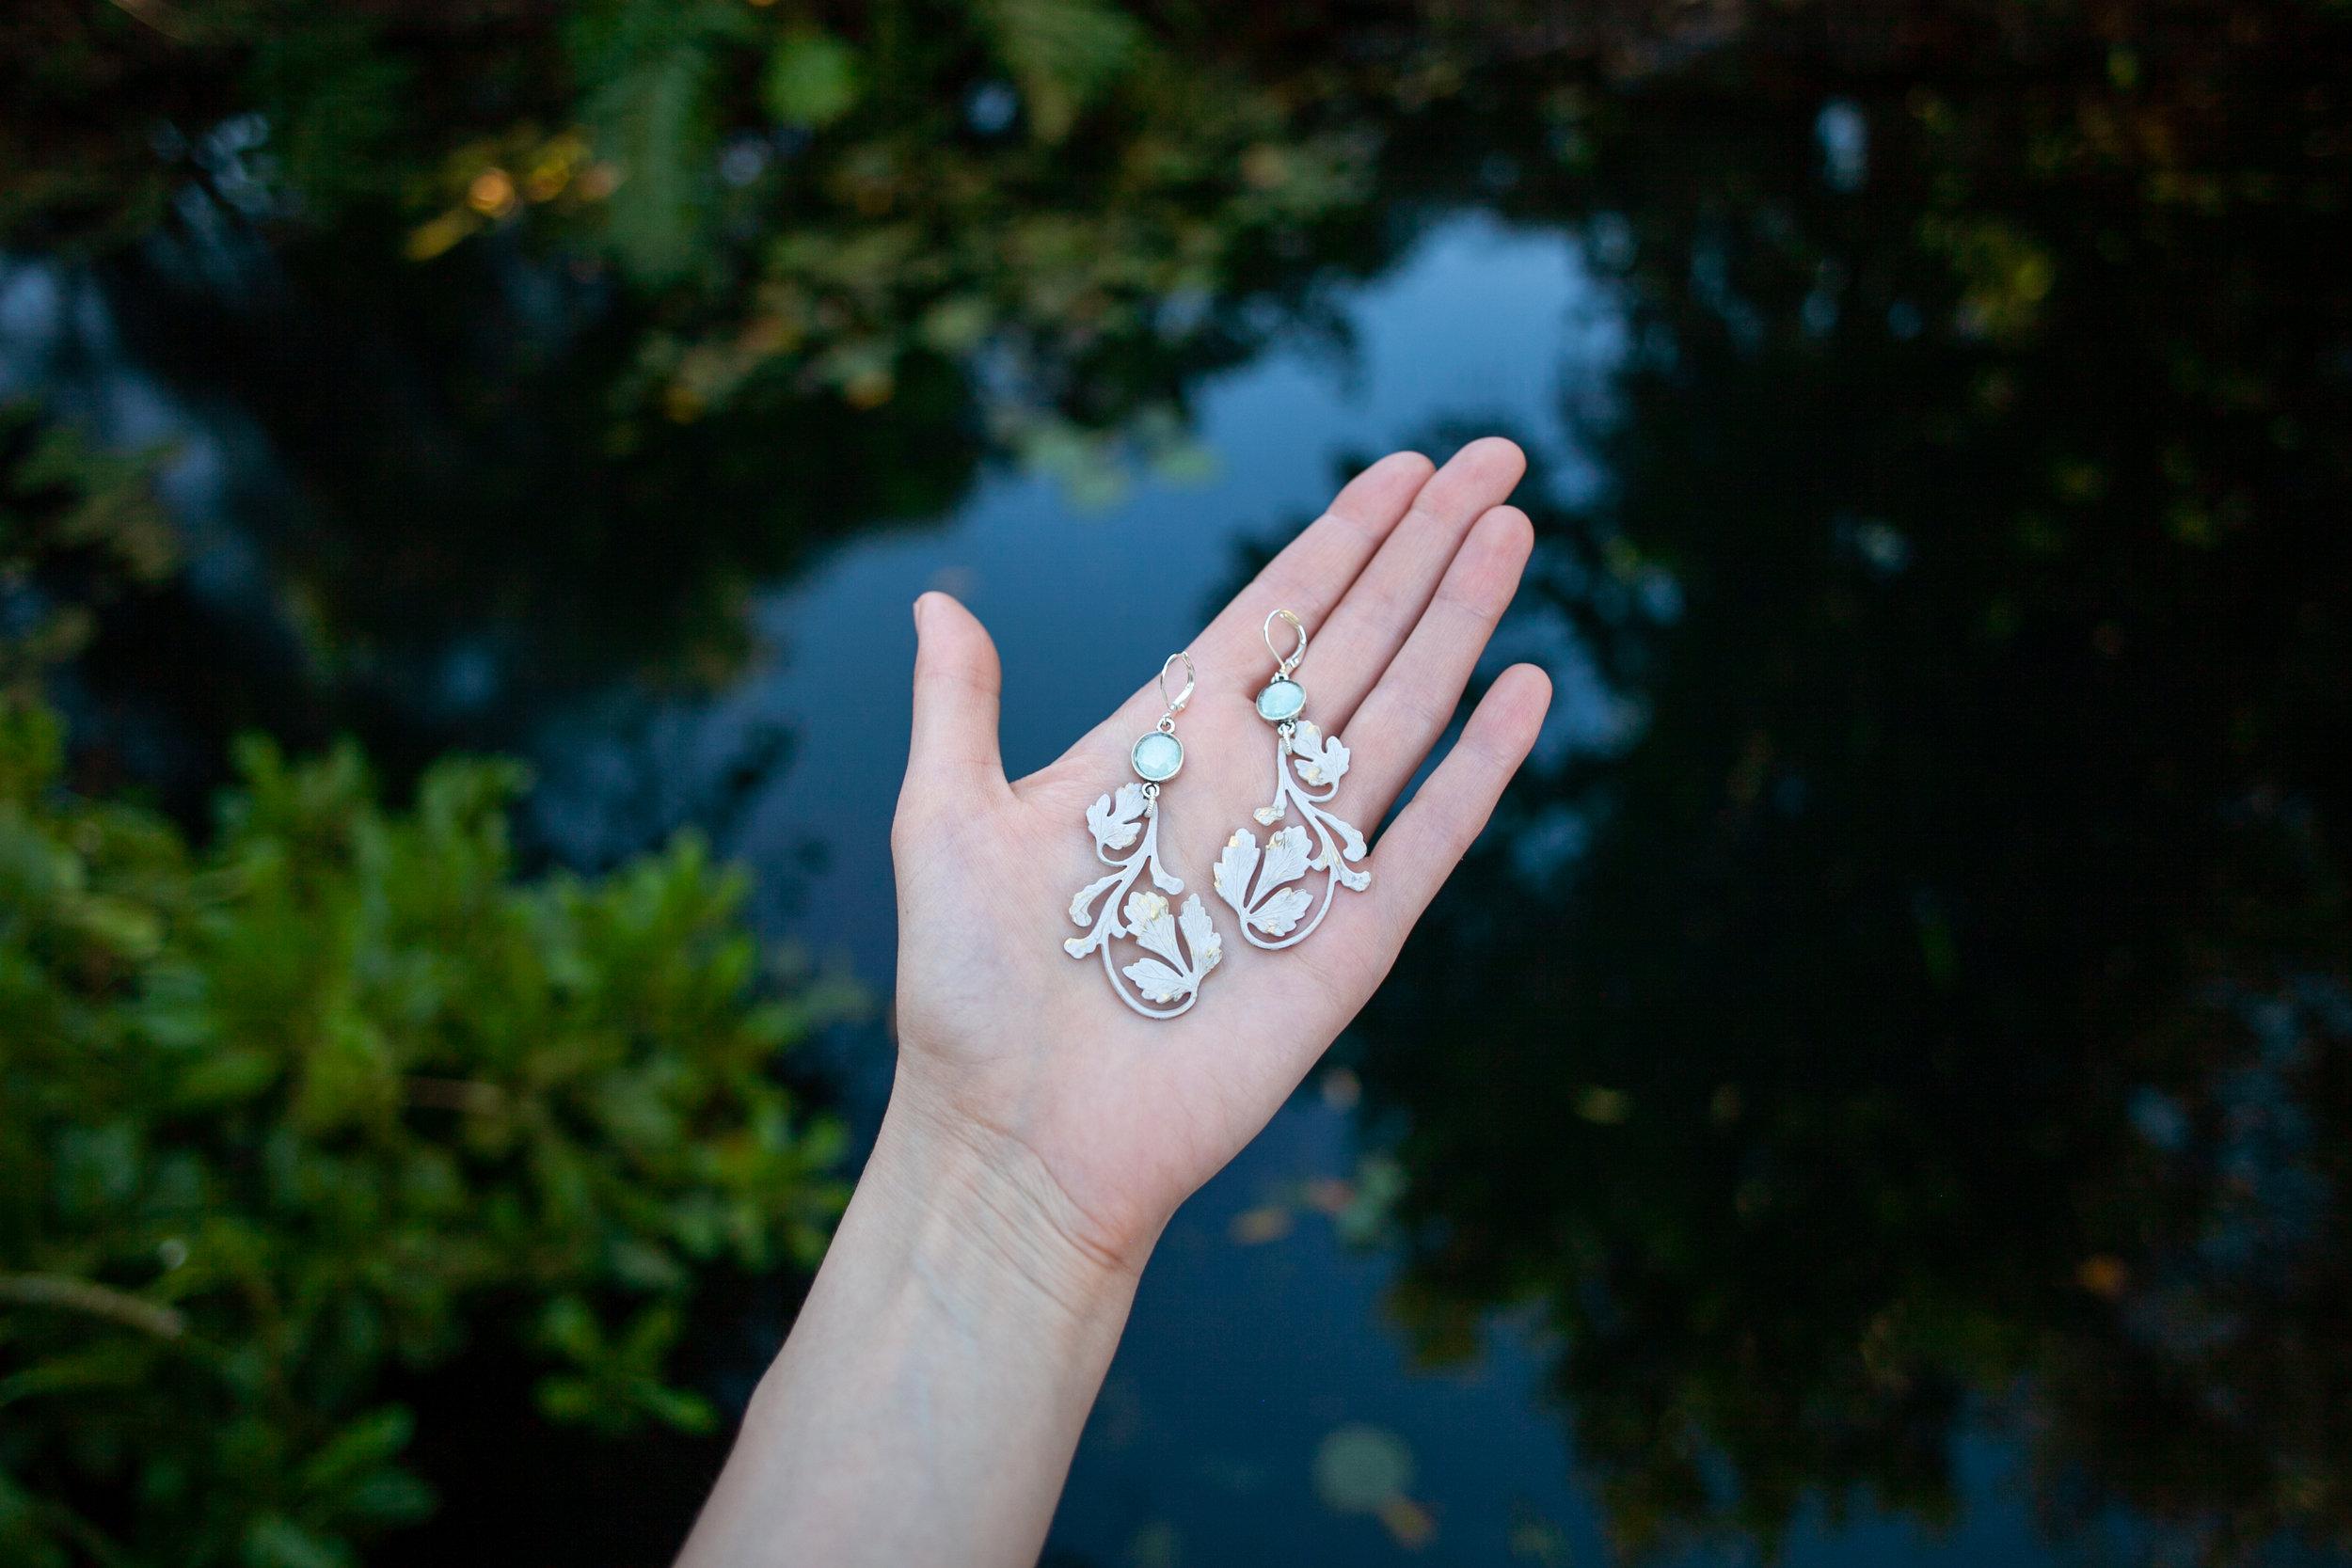 joeyfivecents handmade jewelry by Avi Loren Fox LLC in Caribbean Mexico-5.jpg